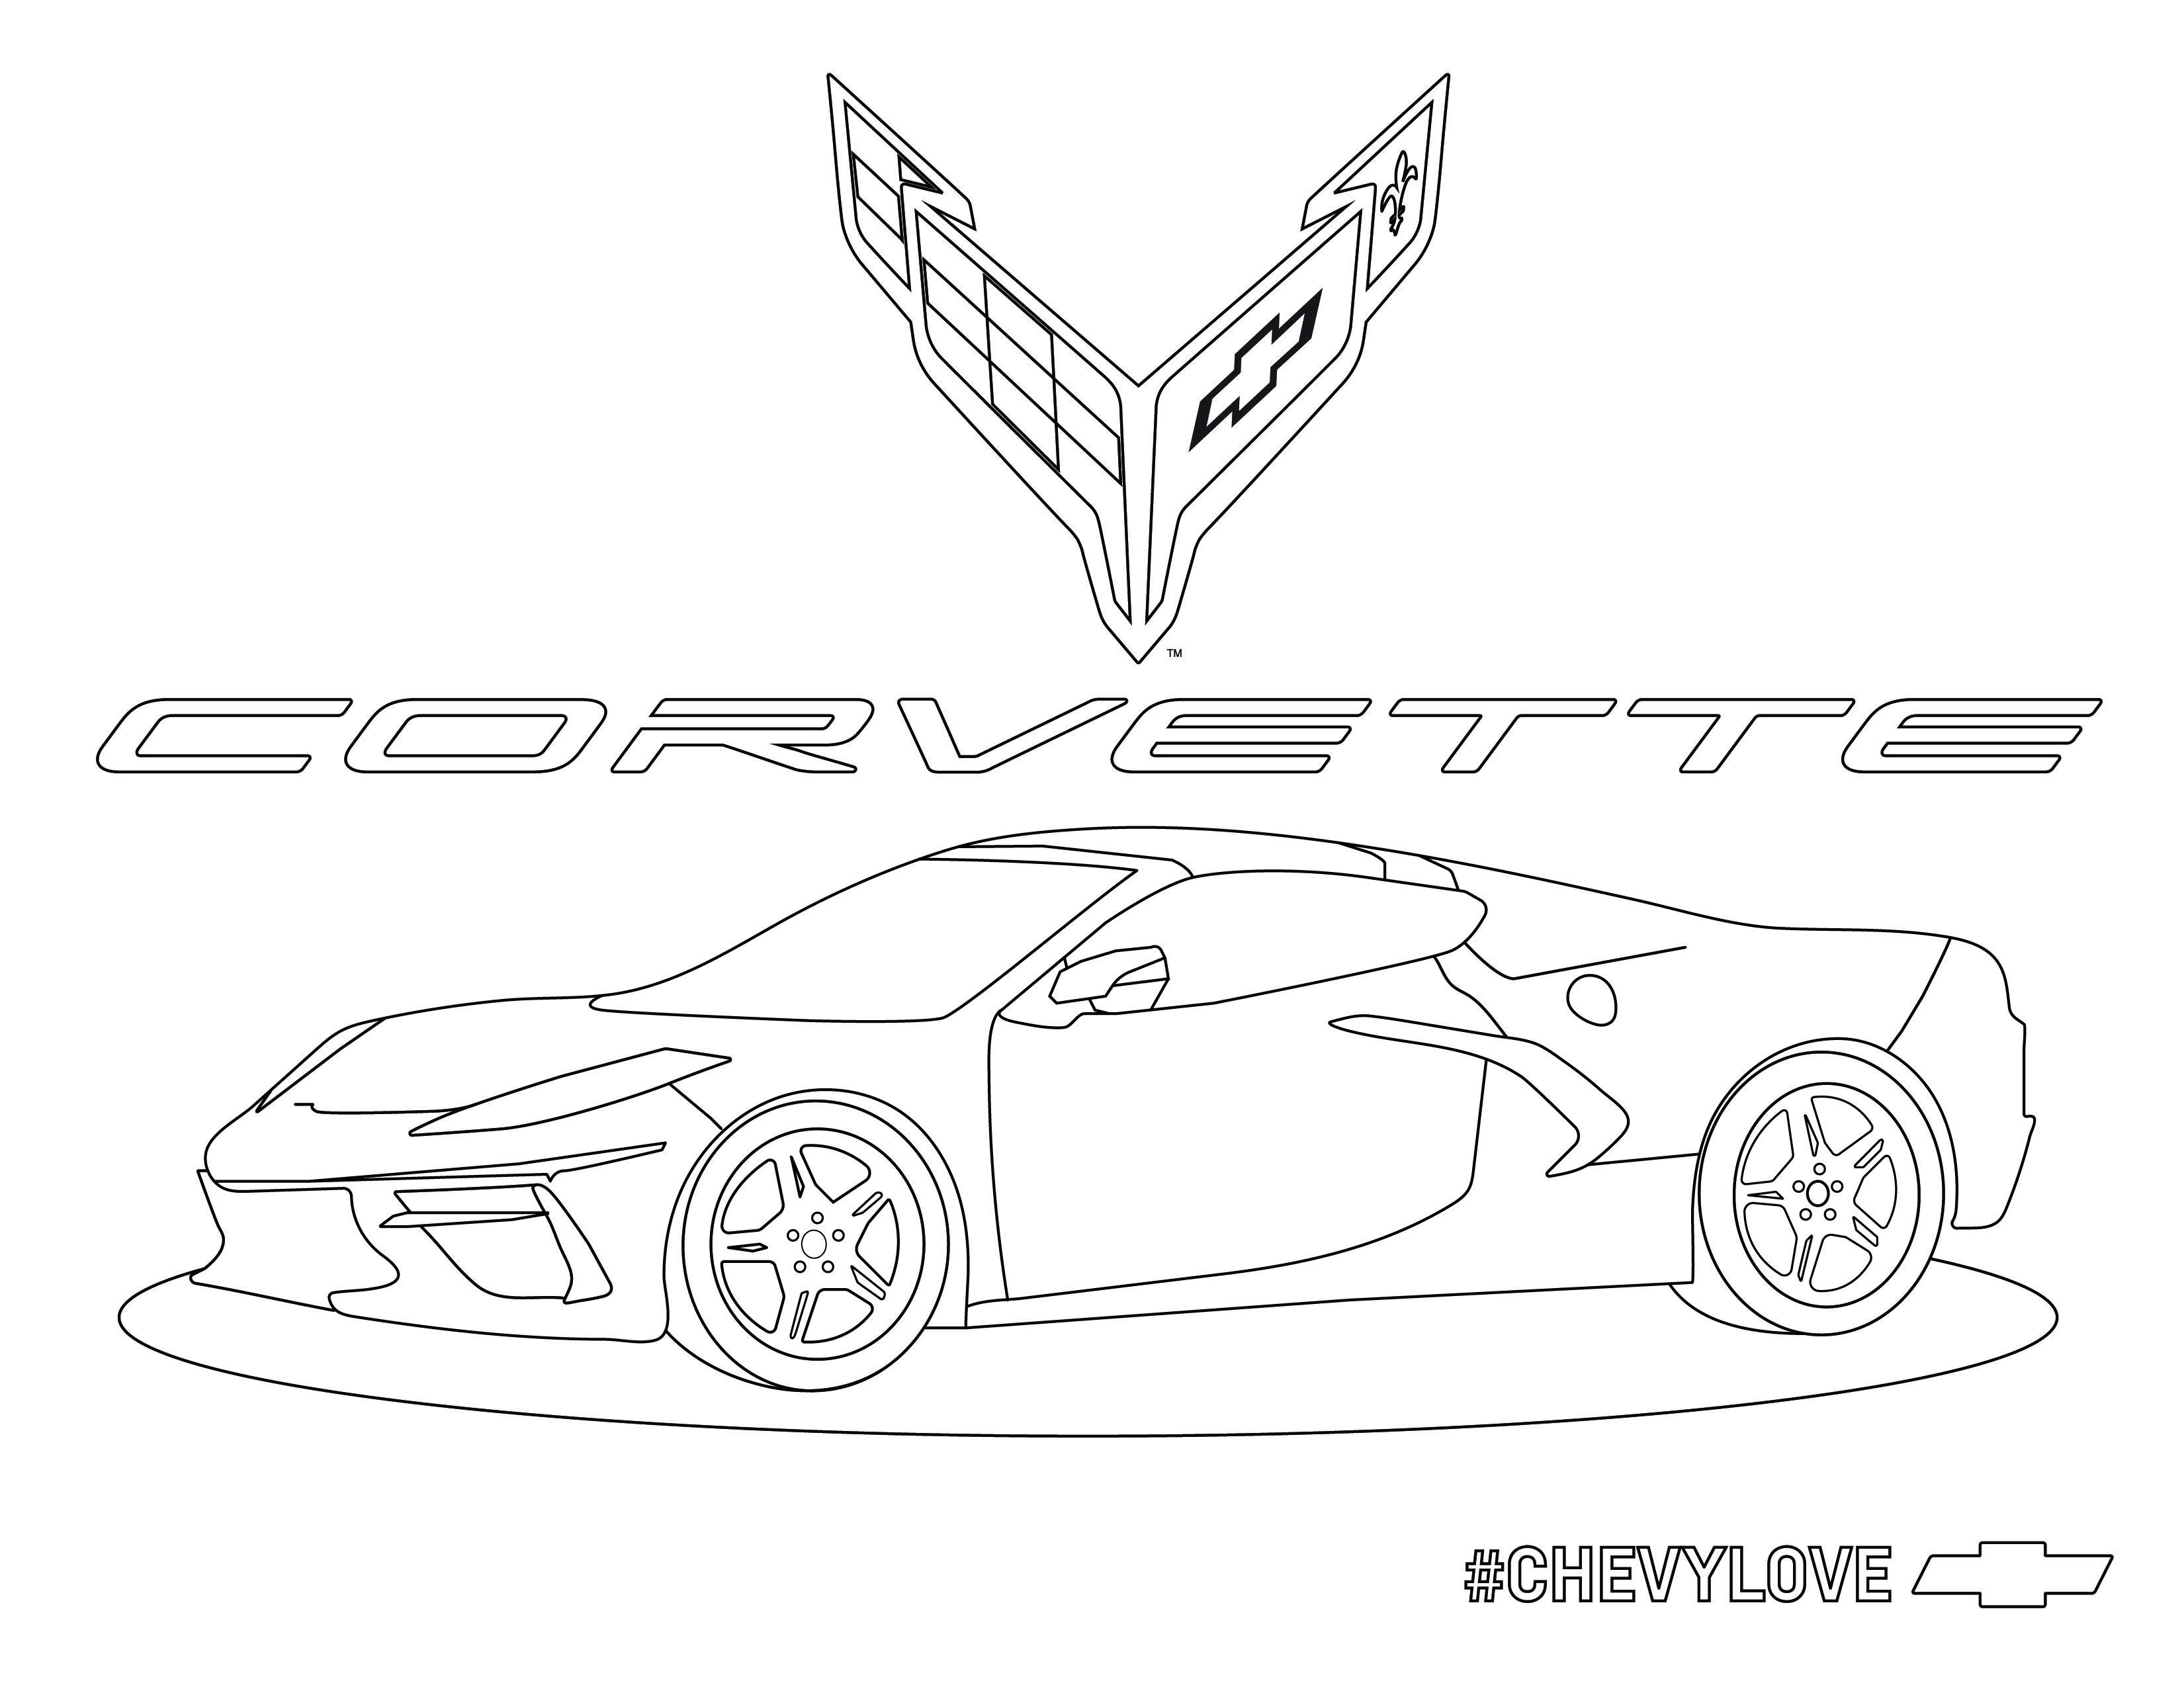 Corvette C8 R Chevy Silverado Hd Coloring Books Car Activities